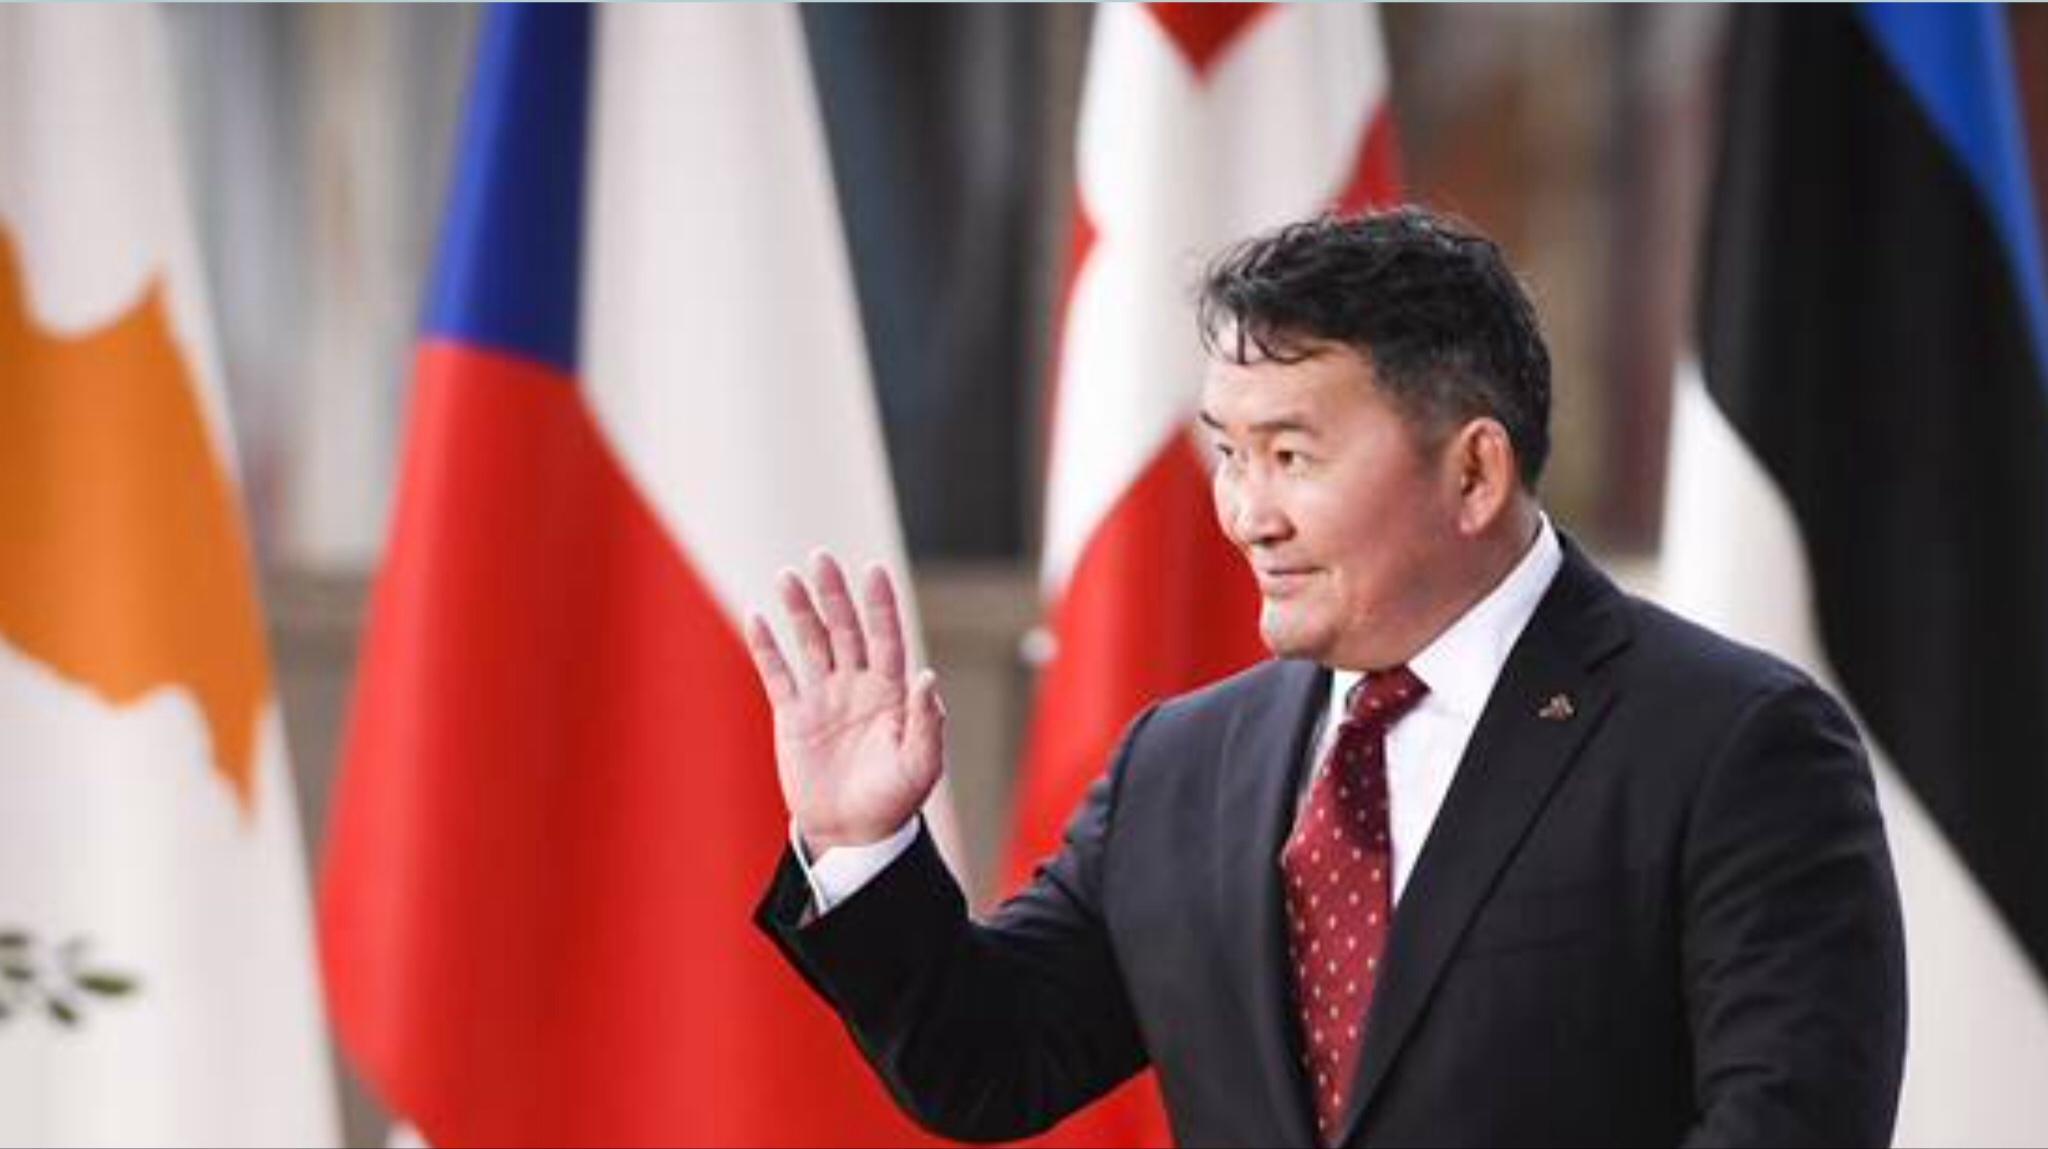 COVID19: Mongolia President in quarantine